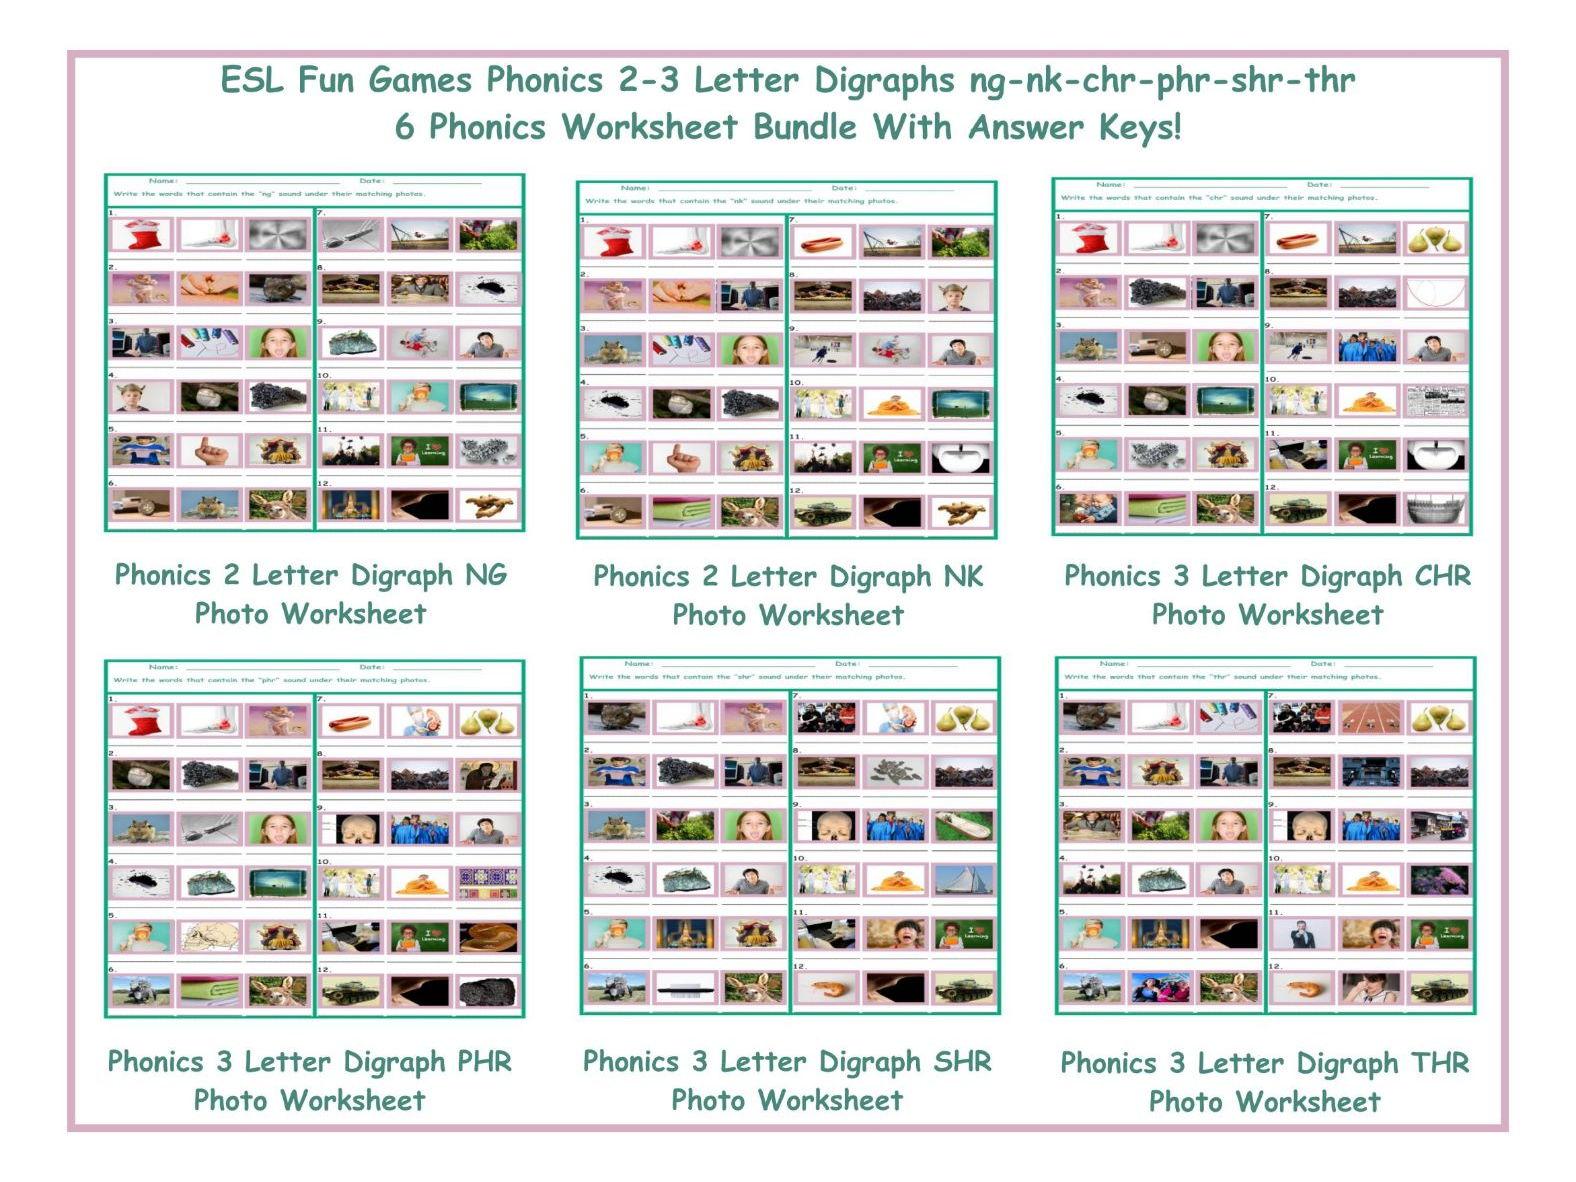 worksheet Thr Worksheets phonics 2 3 letter digraphs ng nk chr phr shr thr worksheet bundle by eslfungames teaching resources tes